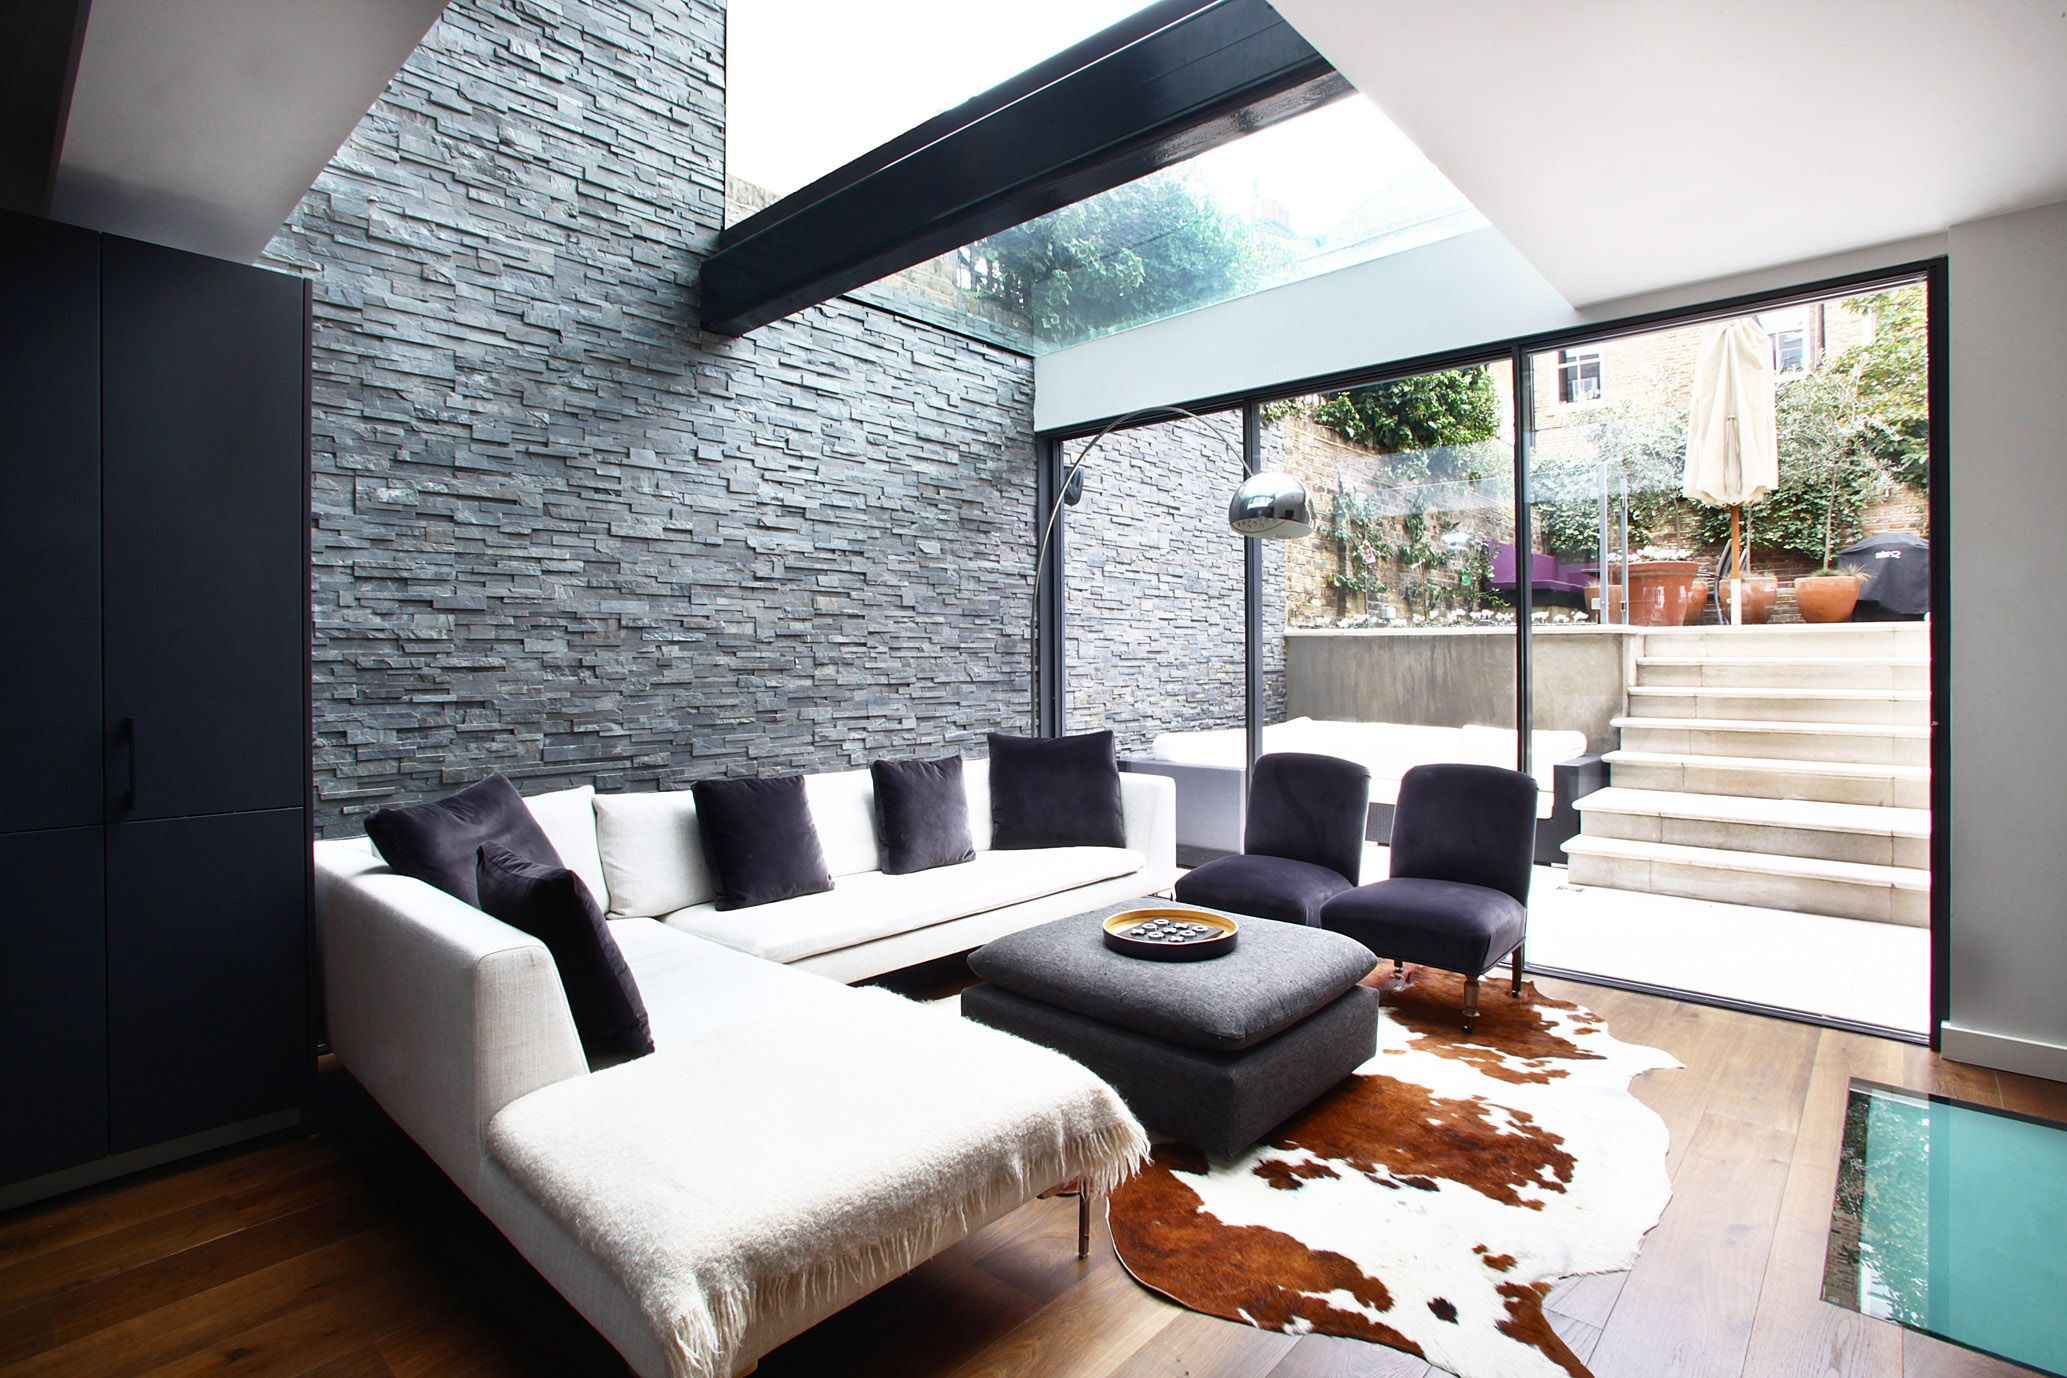 ... Gorgeous Townhouse Finished Basement Ideas Basement Remodel Splurge Vs  Save ...